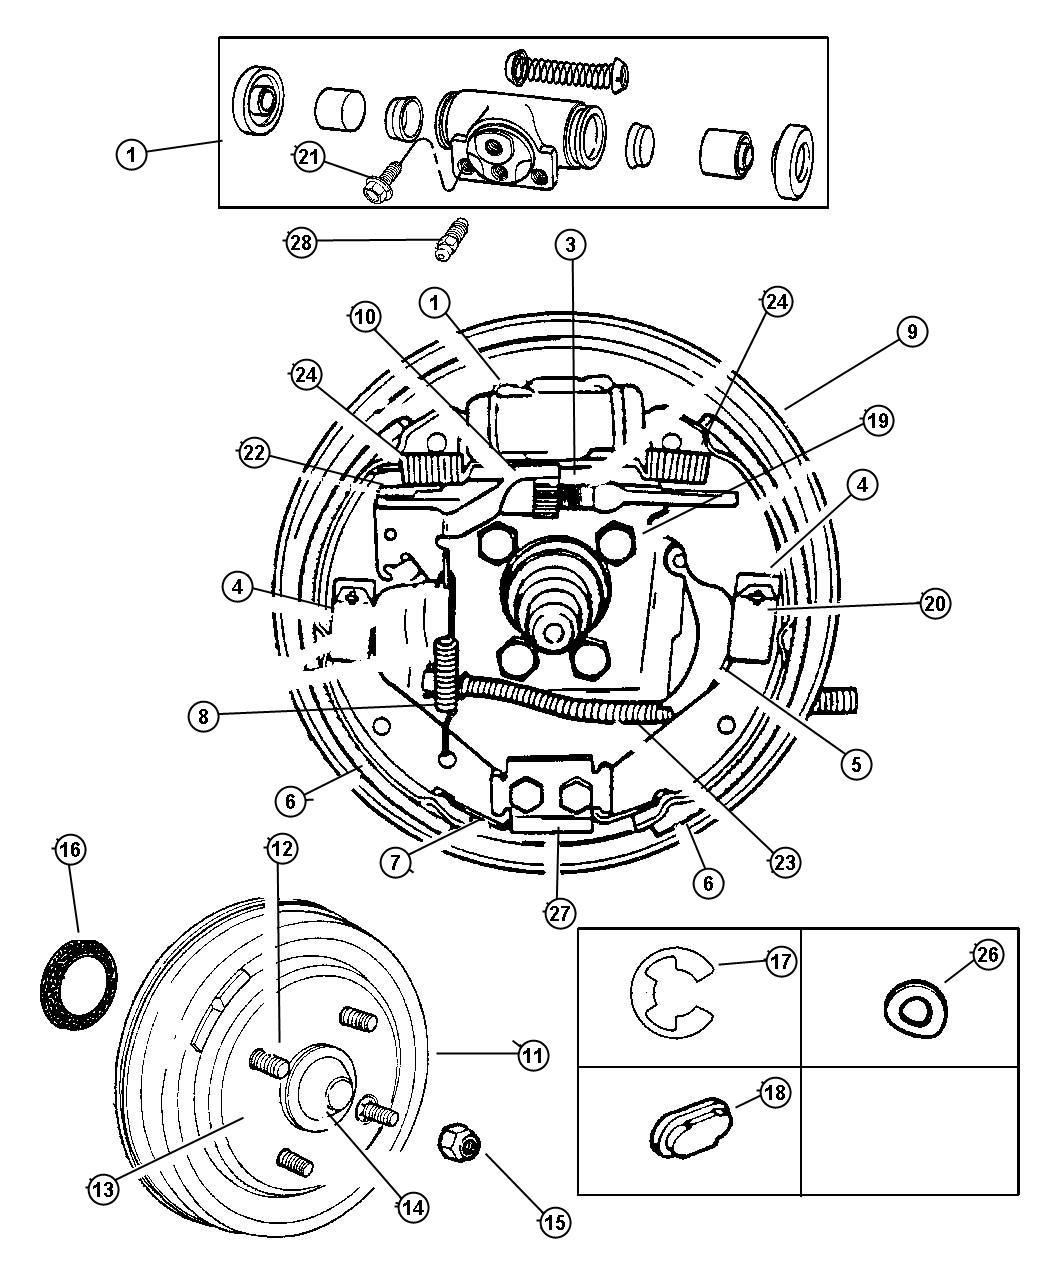 gear train line diagram